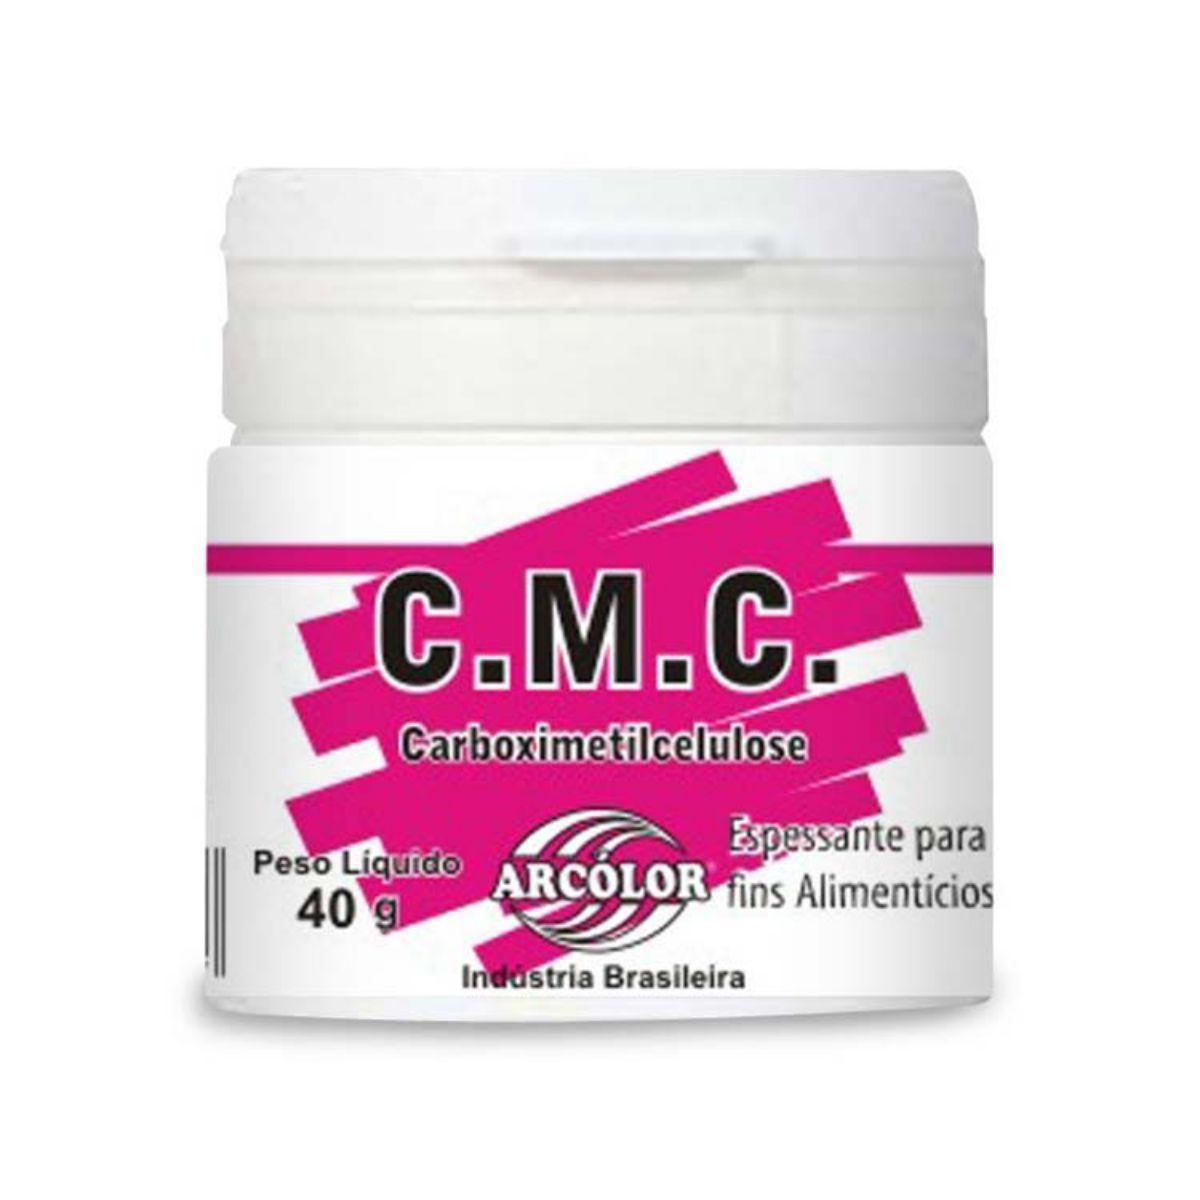 C M C Arcólor 40g Carboximetilcelulose